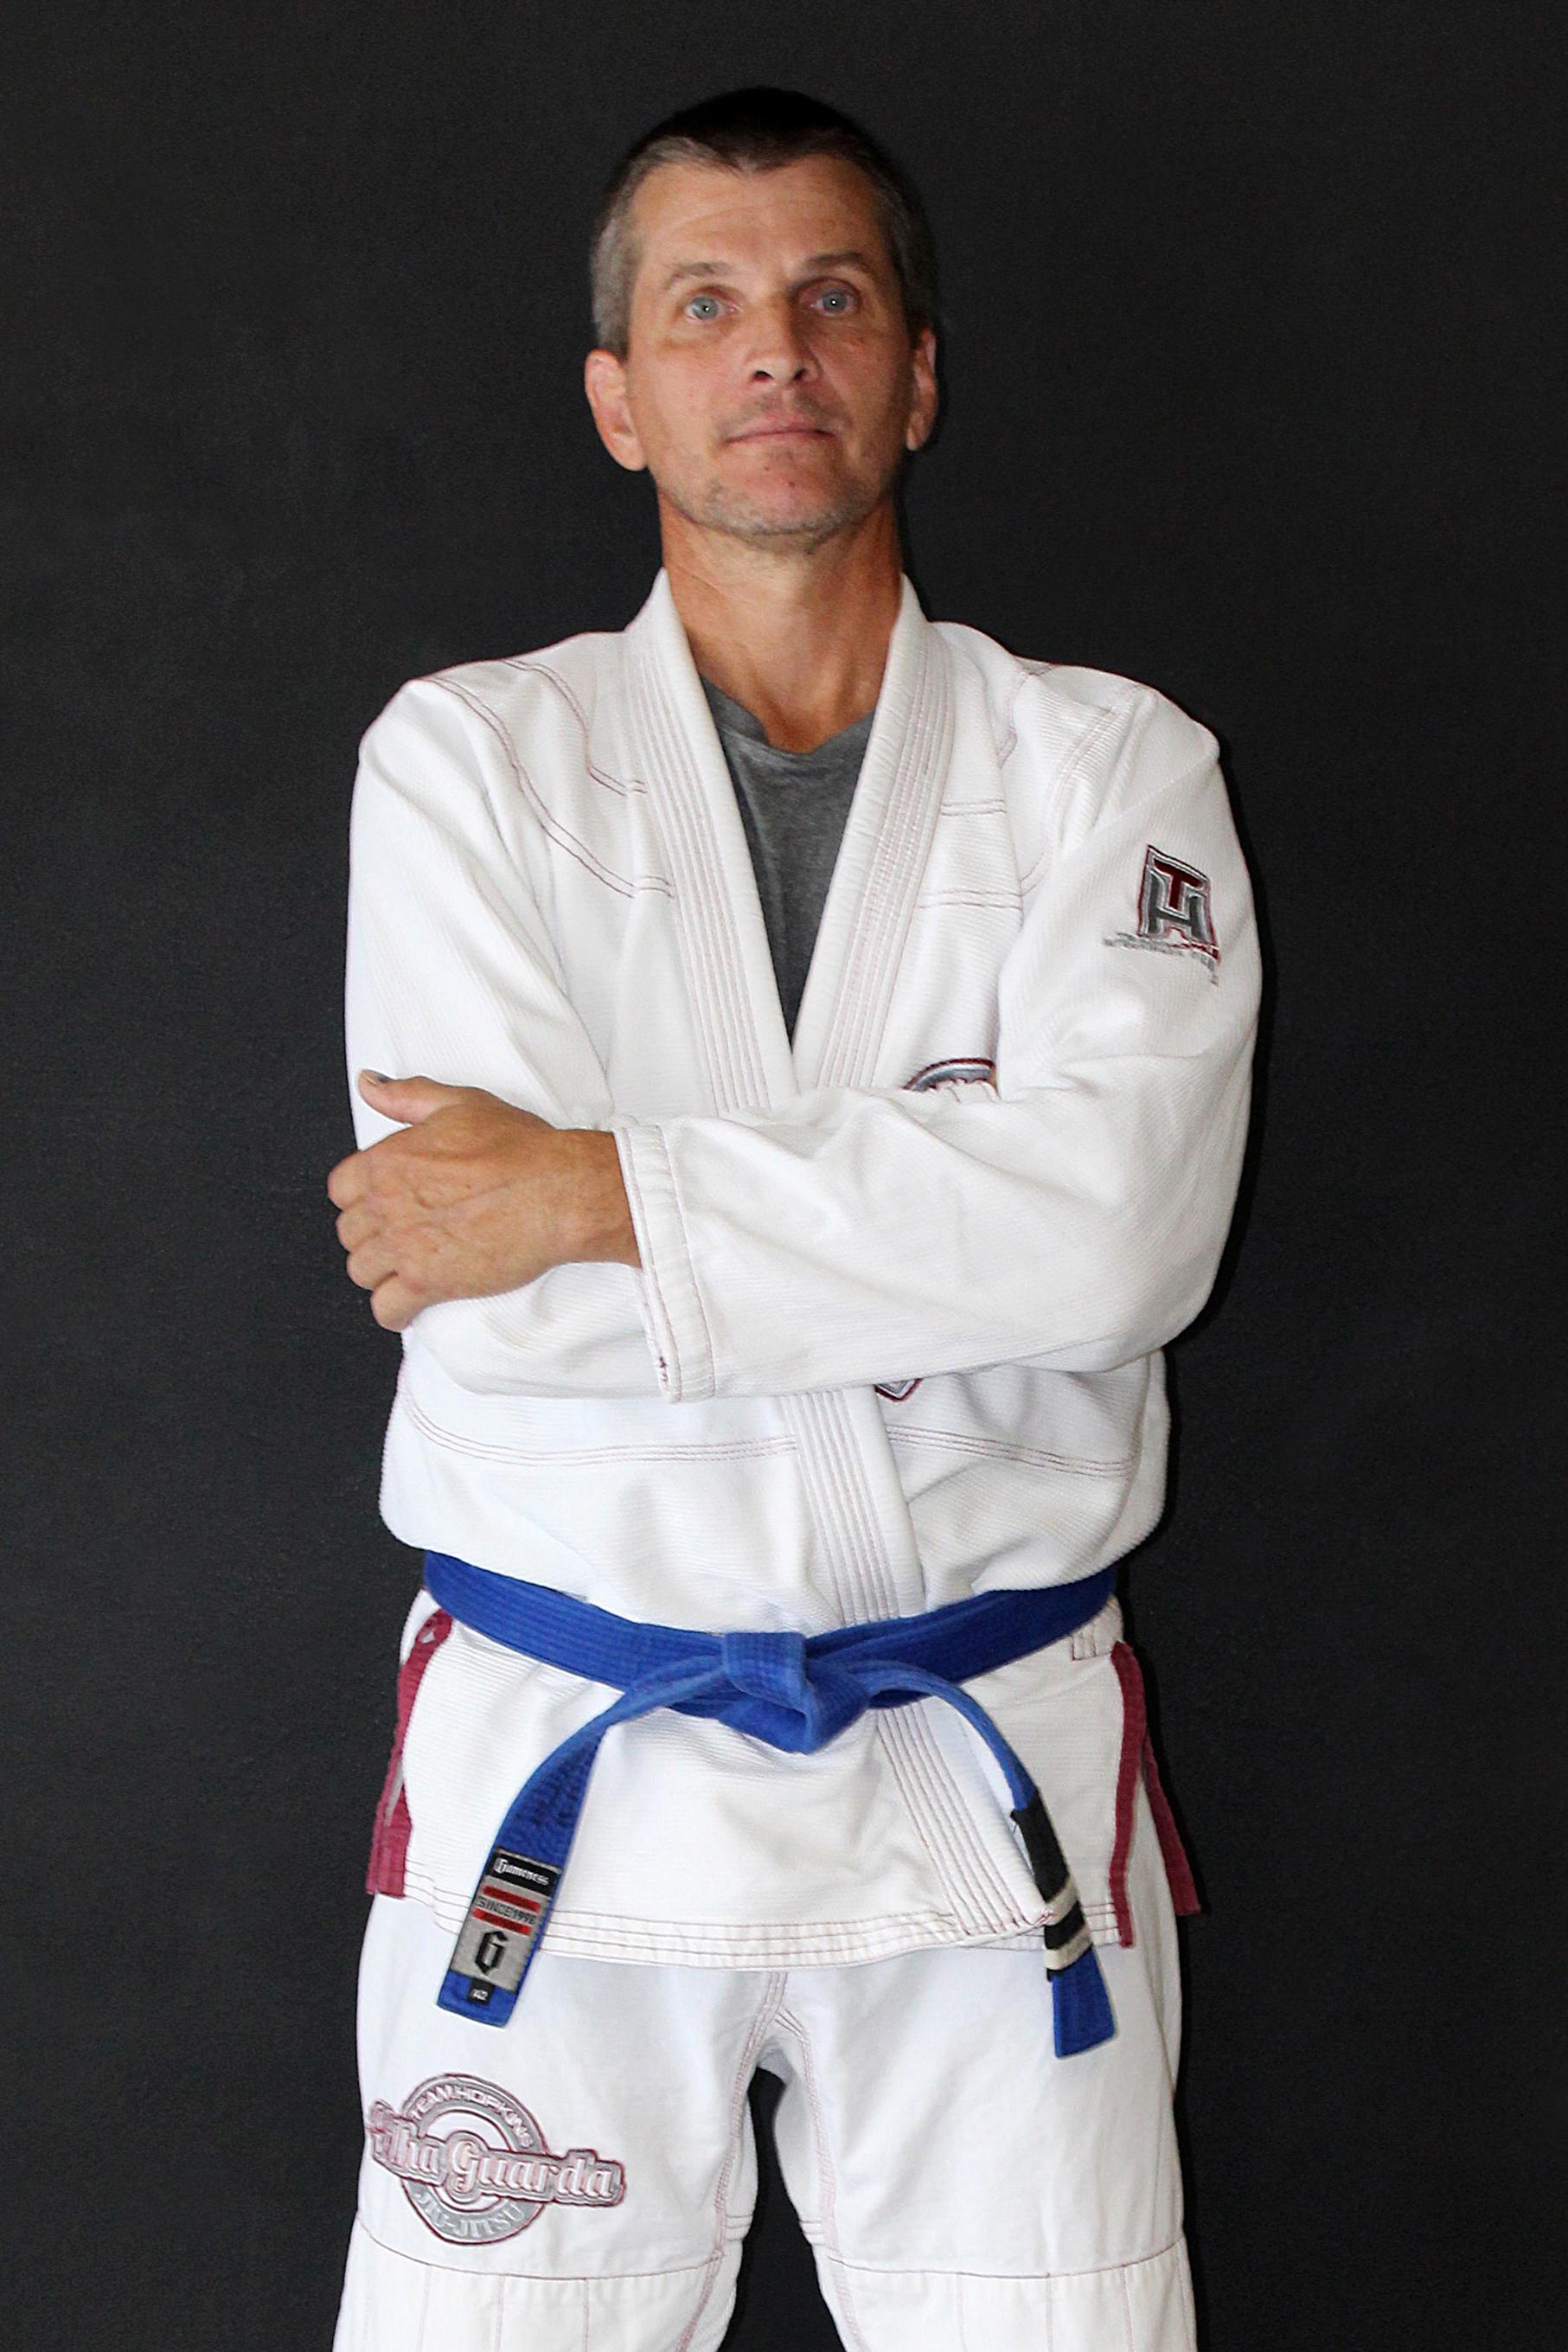 David Hollingsworth - InstructorDavid is a Gracie Jiu-Jitsu Blue Belt under Black Belt Mike Braswell.